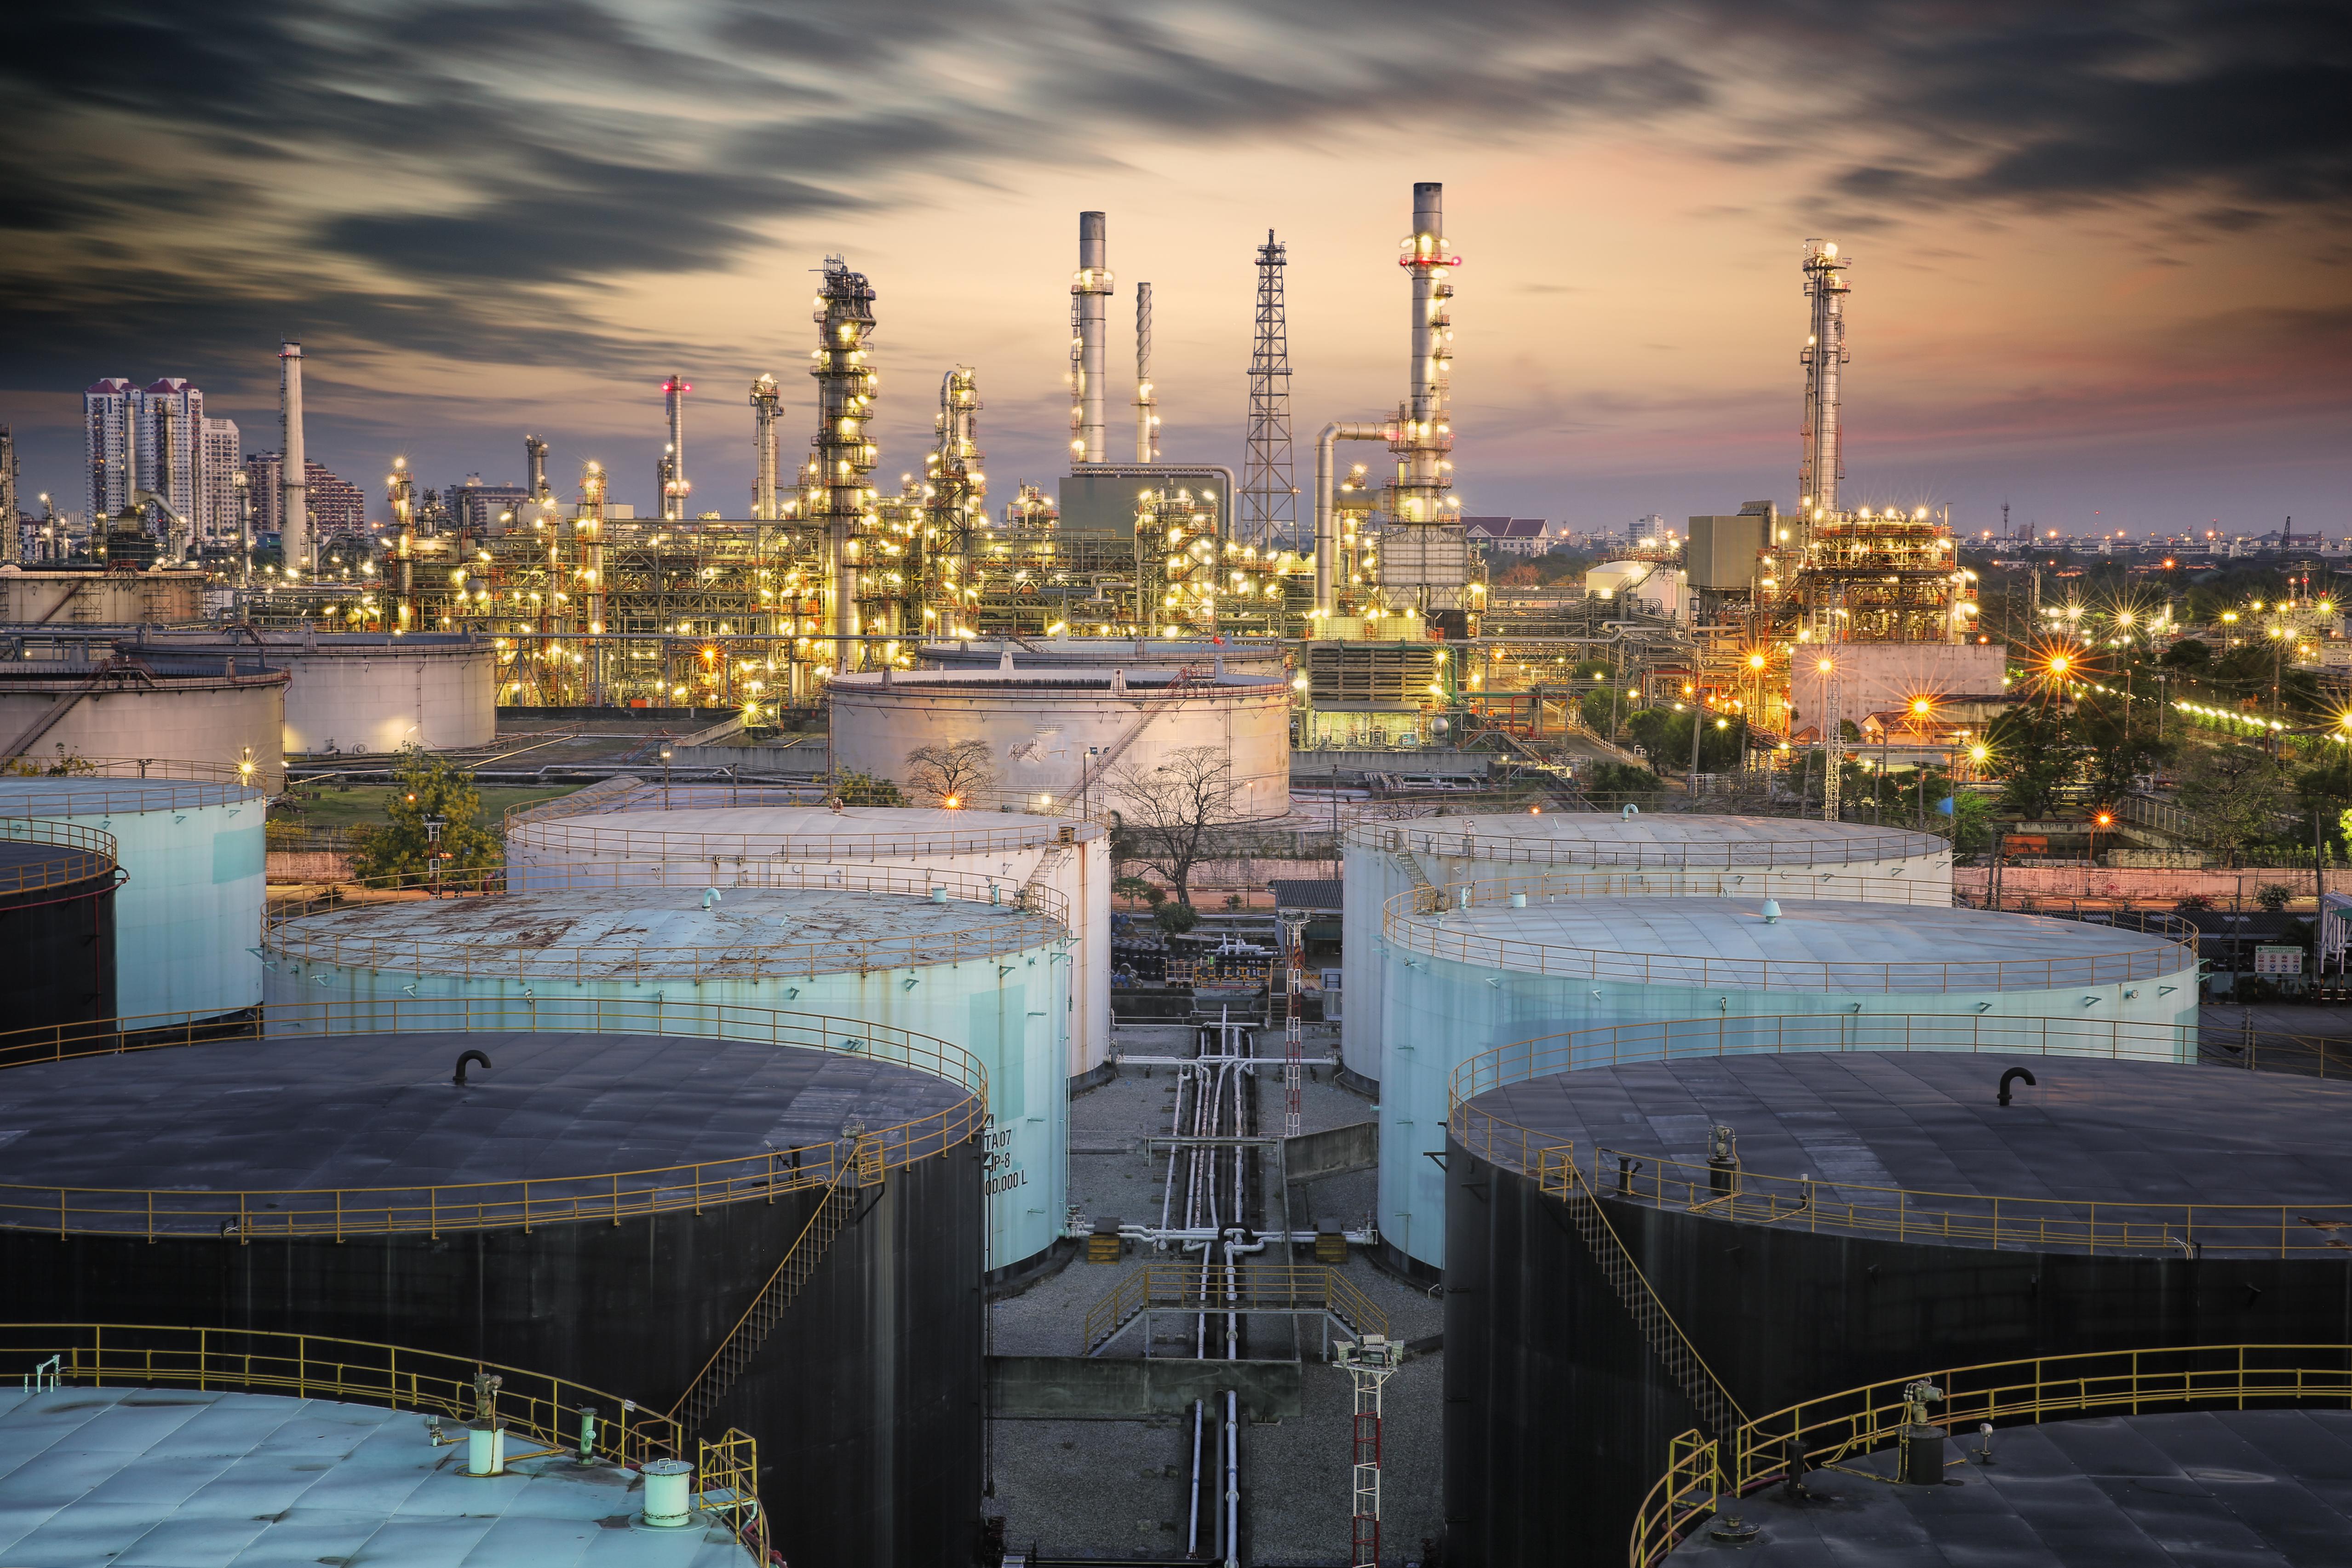 A refinery with storage tanks.